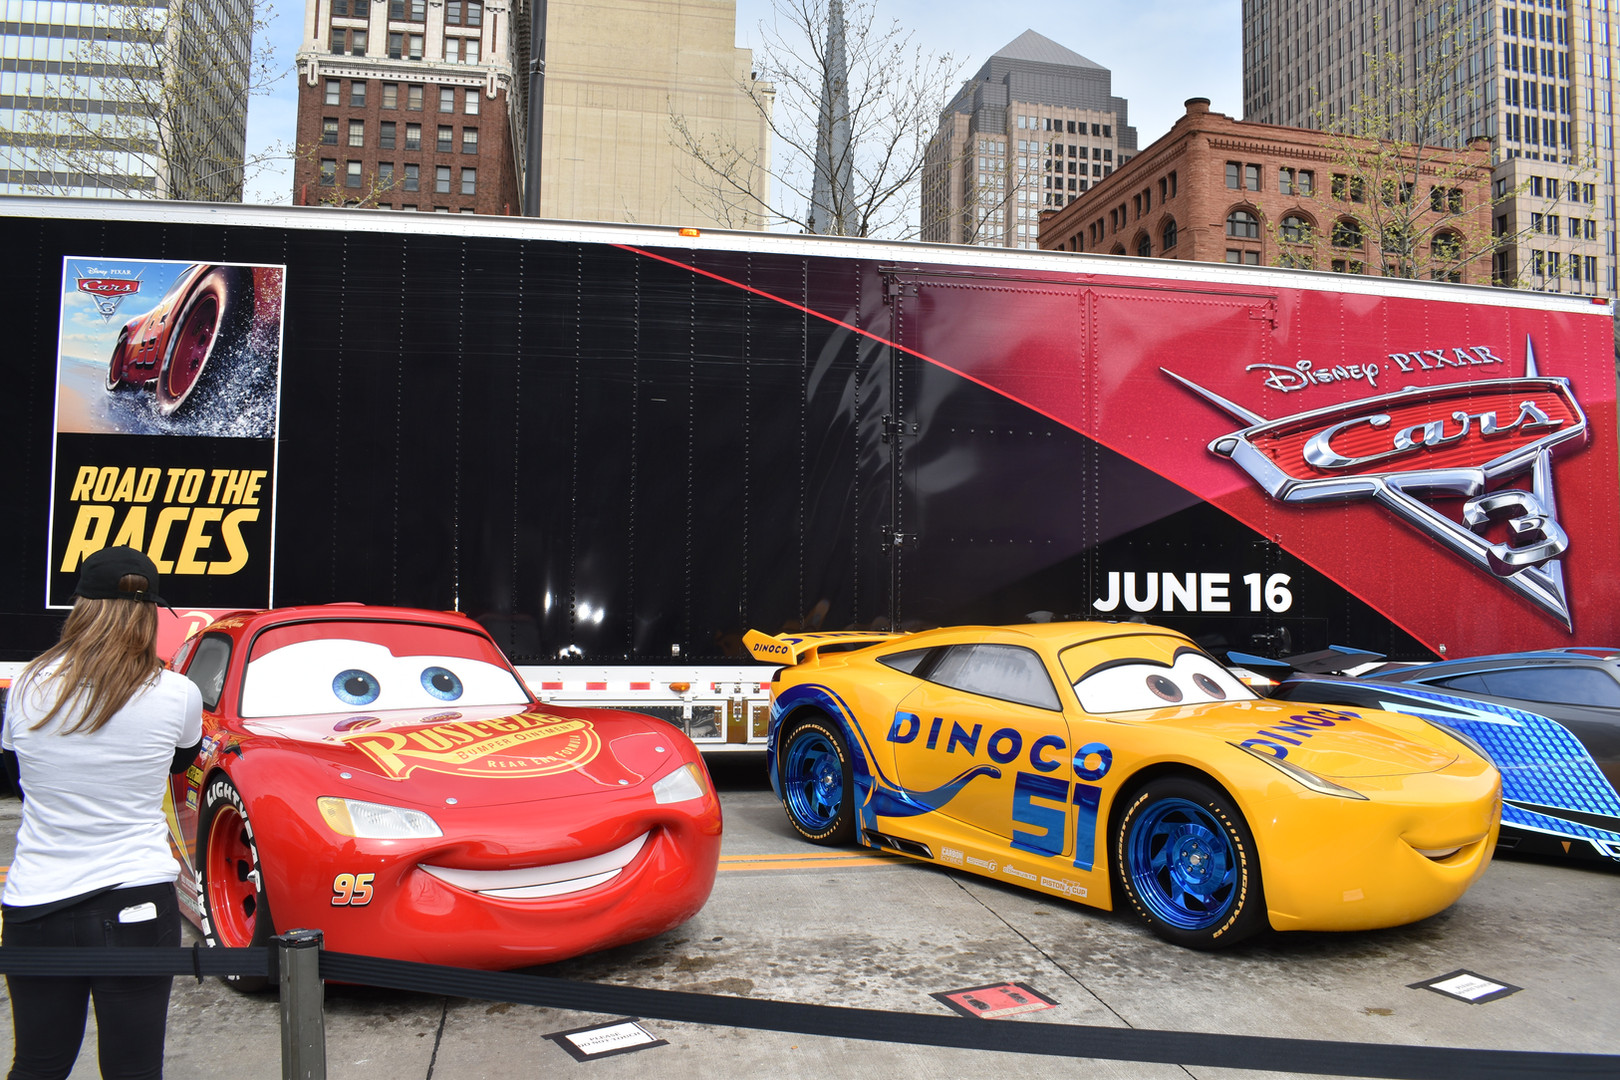 Disney Pixar's Cars promotion